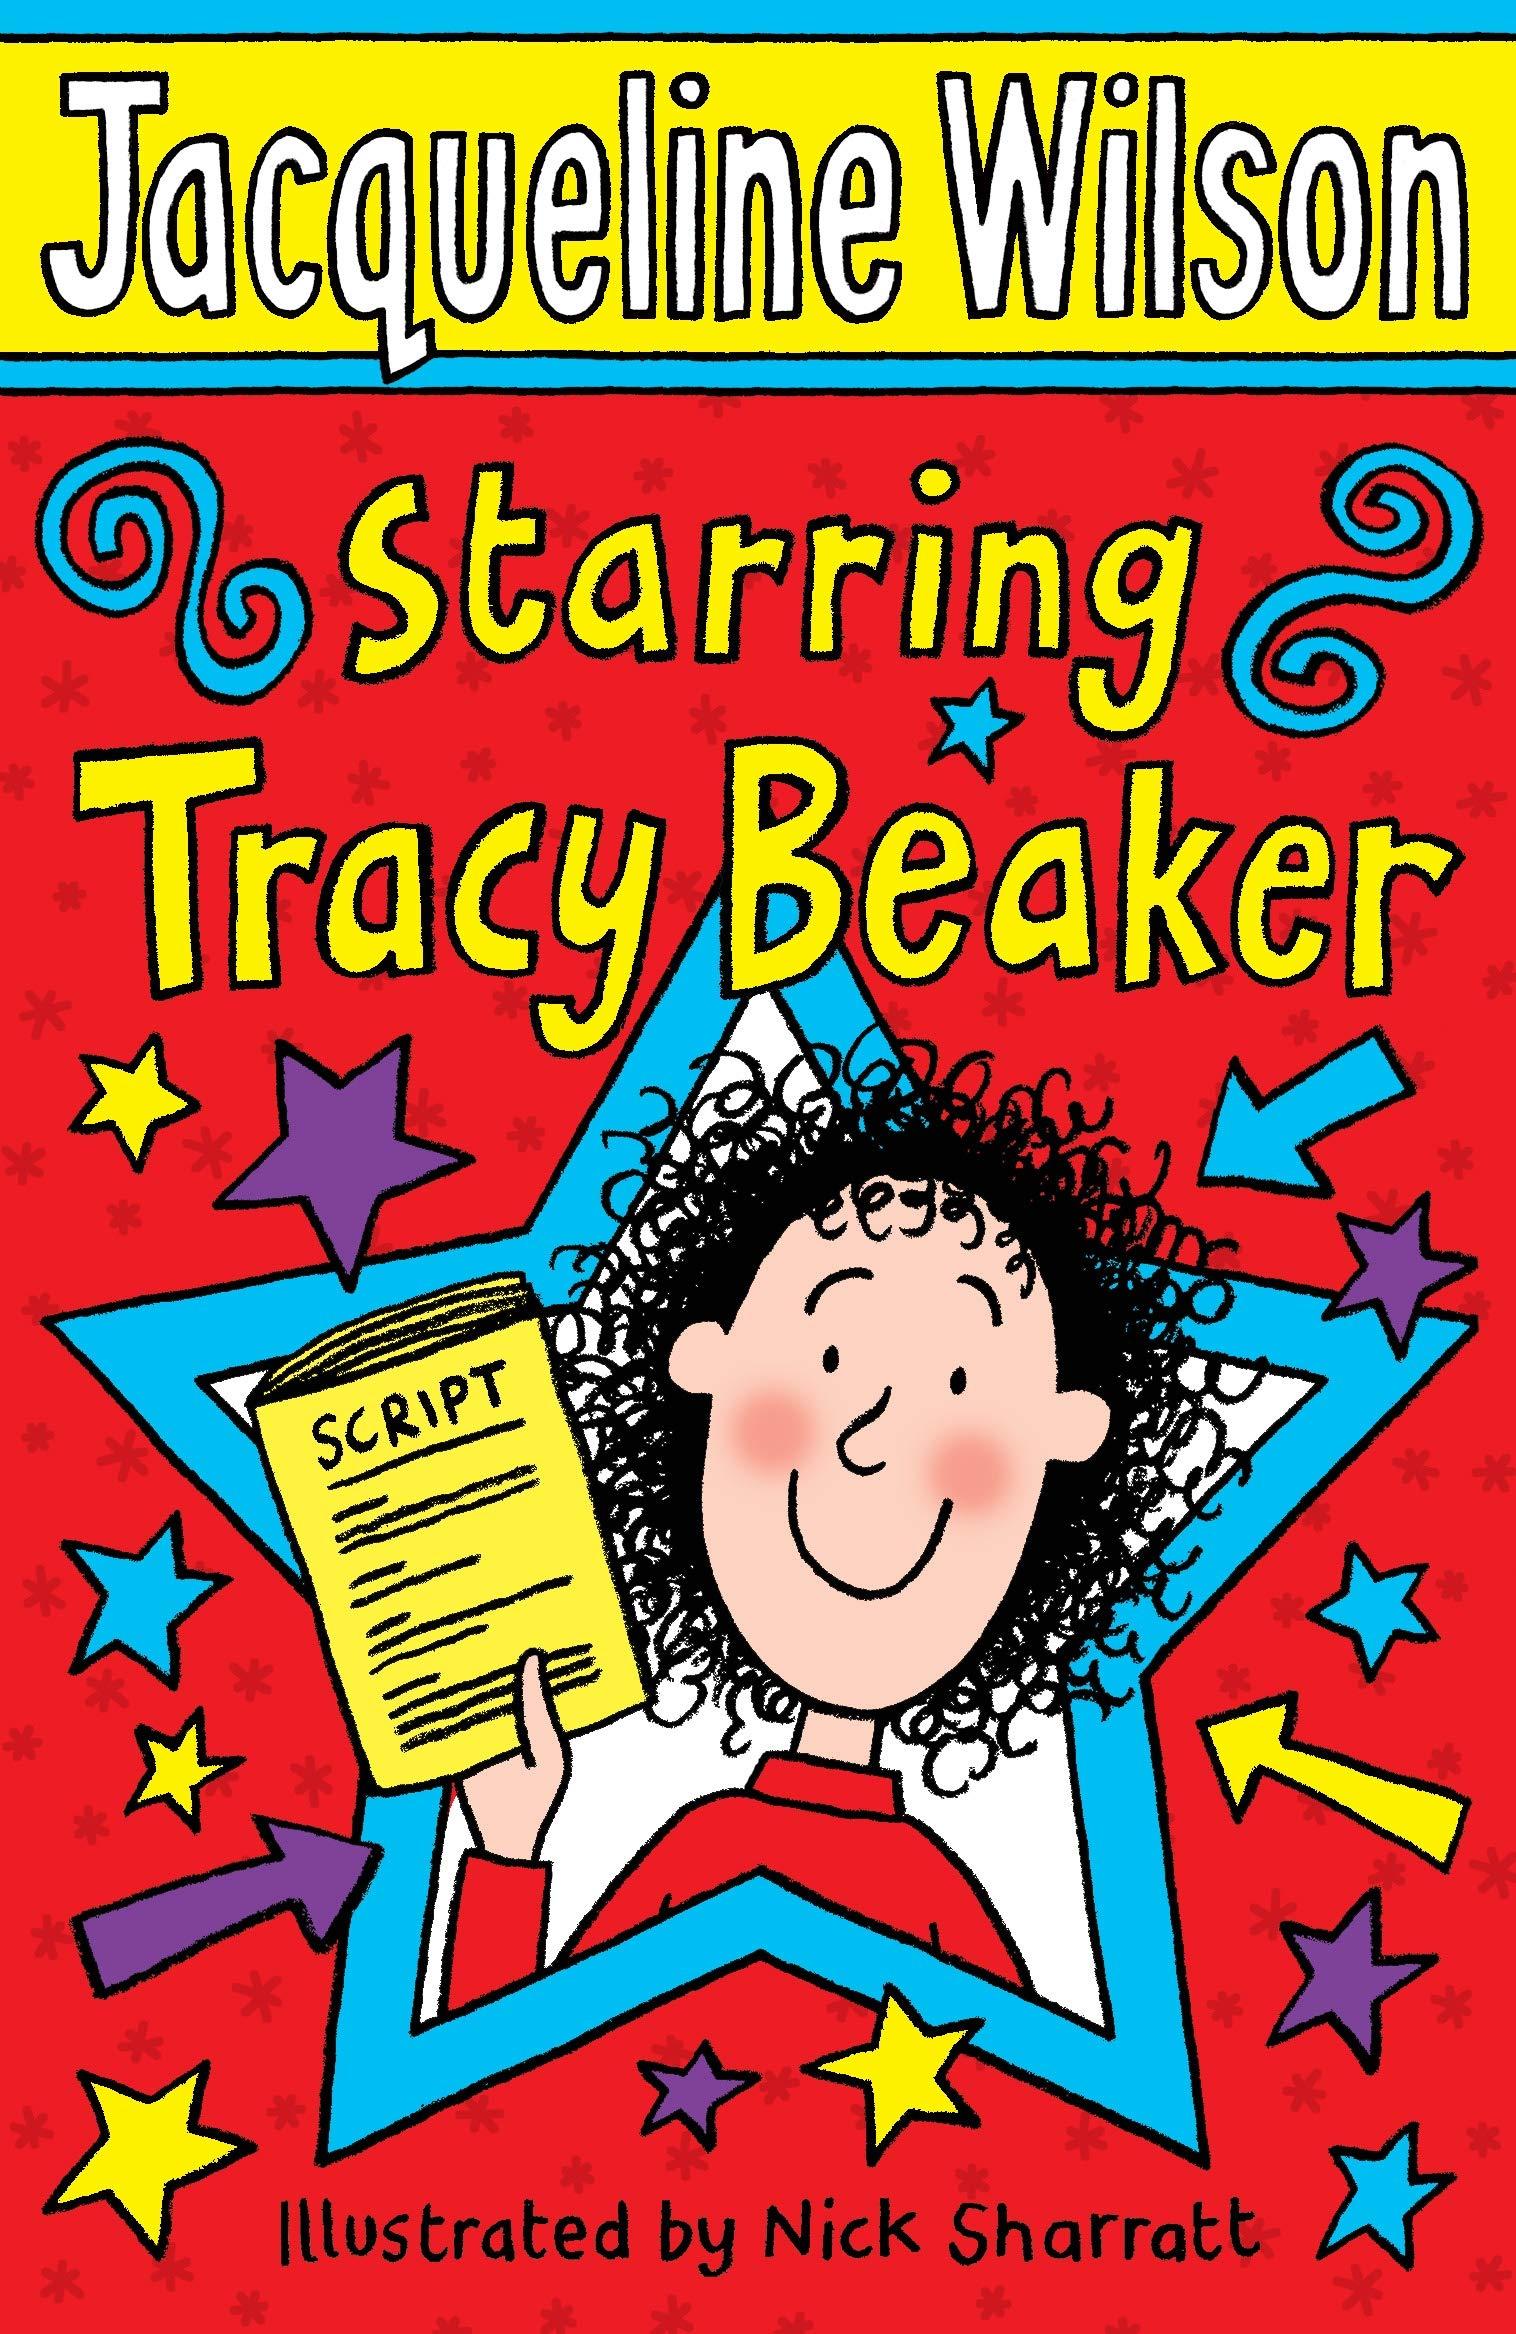 Starring Tracy Beaker pdf epub